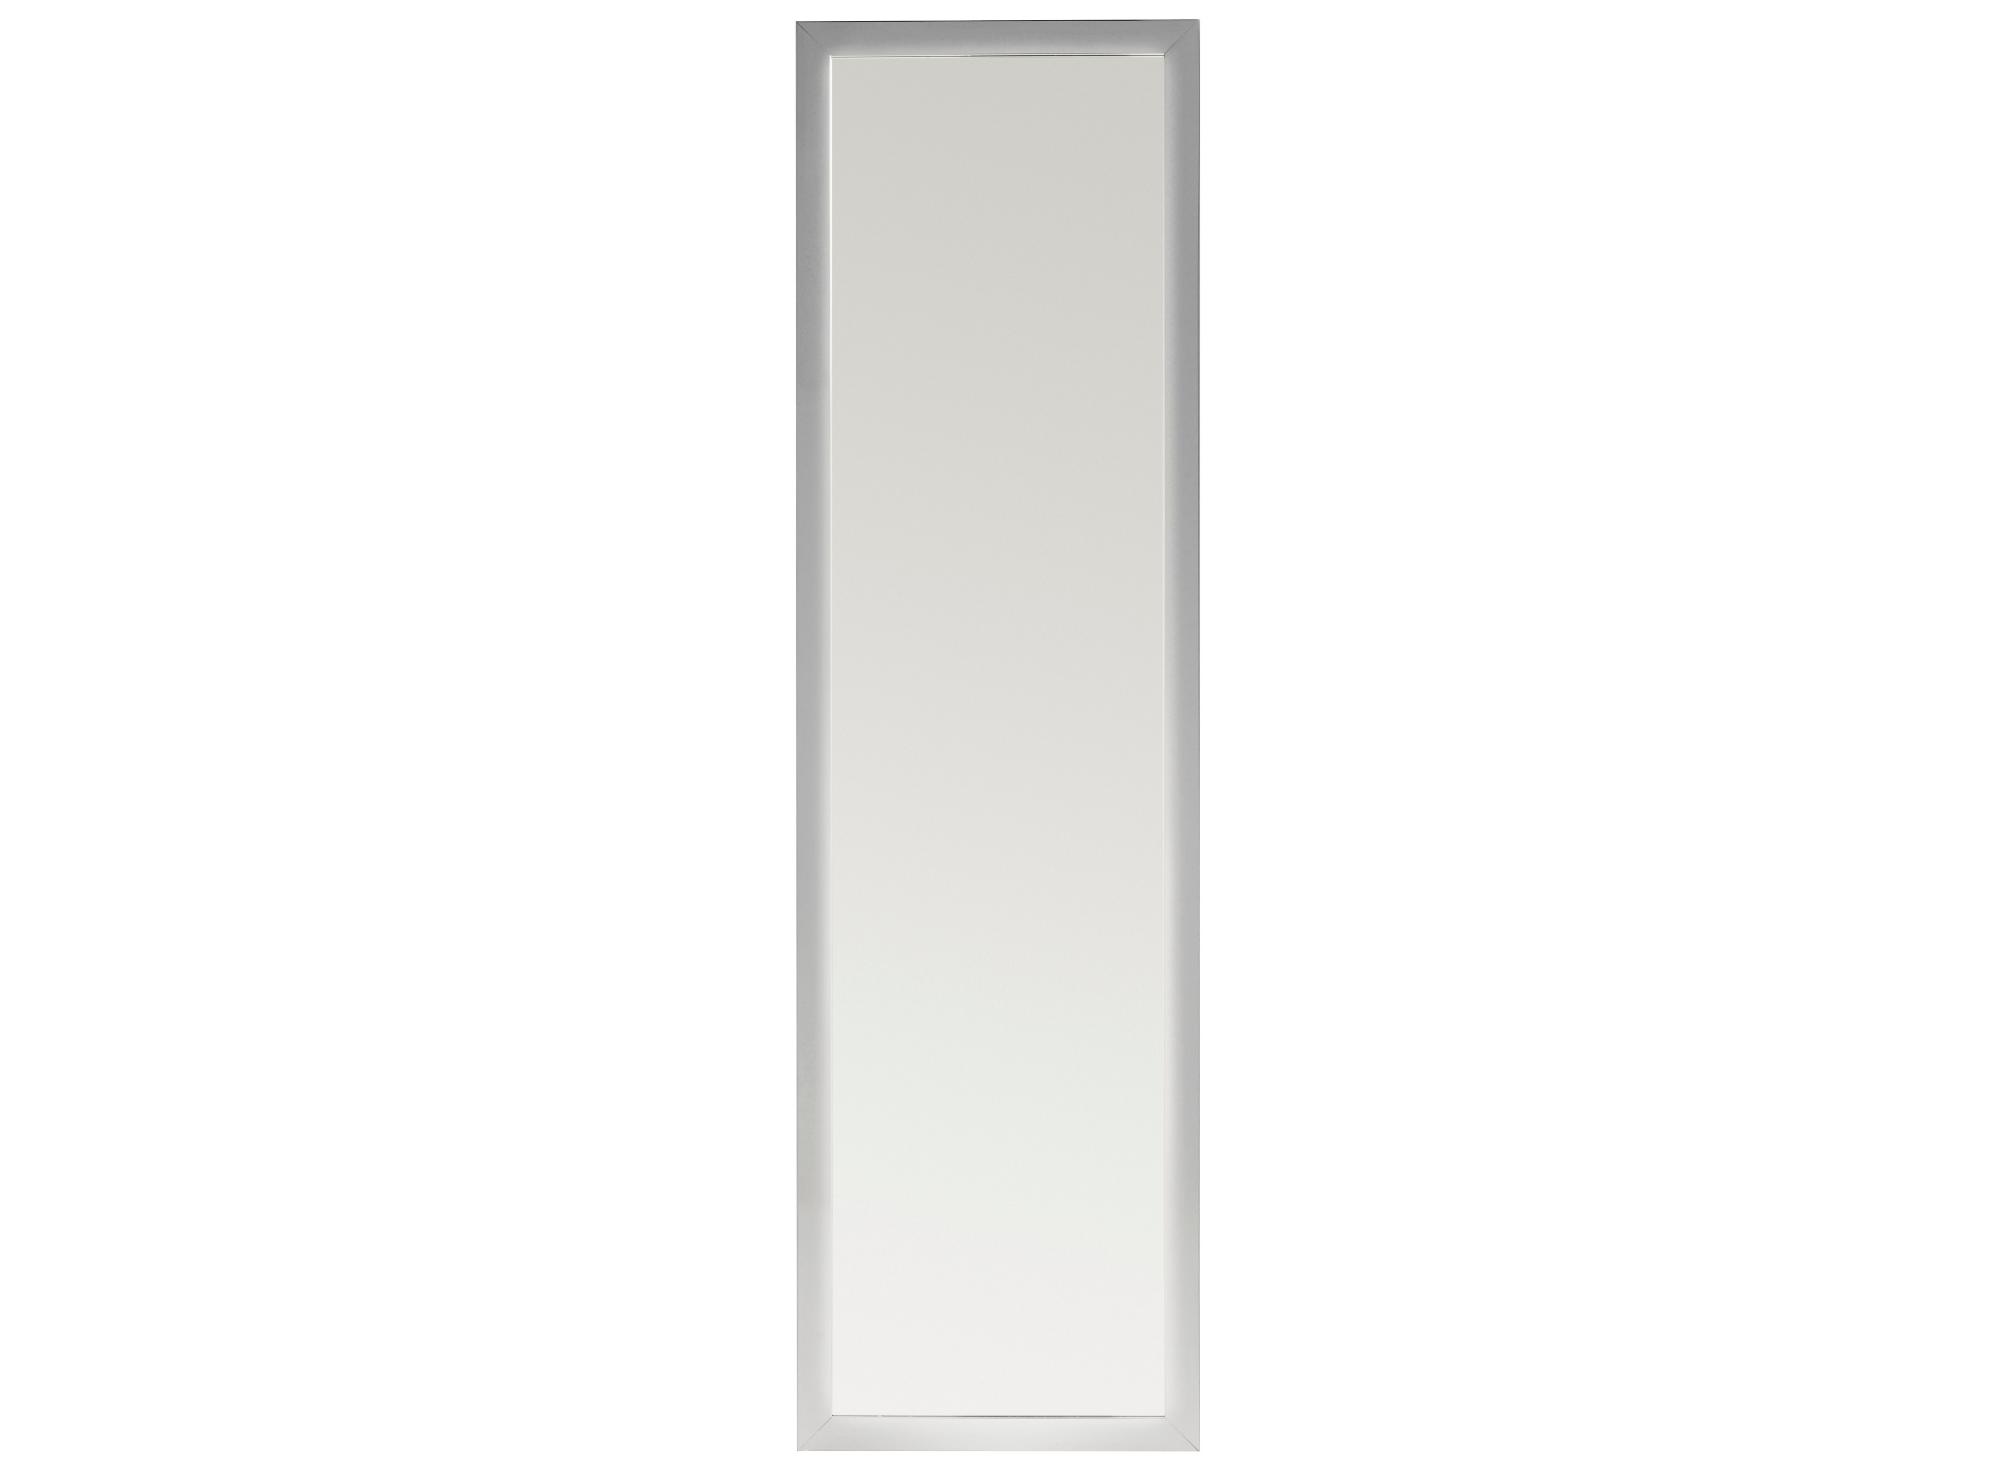 Miroir 30x120cm cadre resine argent fly for Miroir sans fond